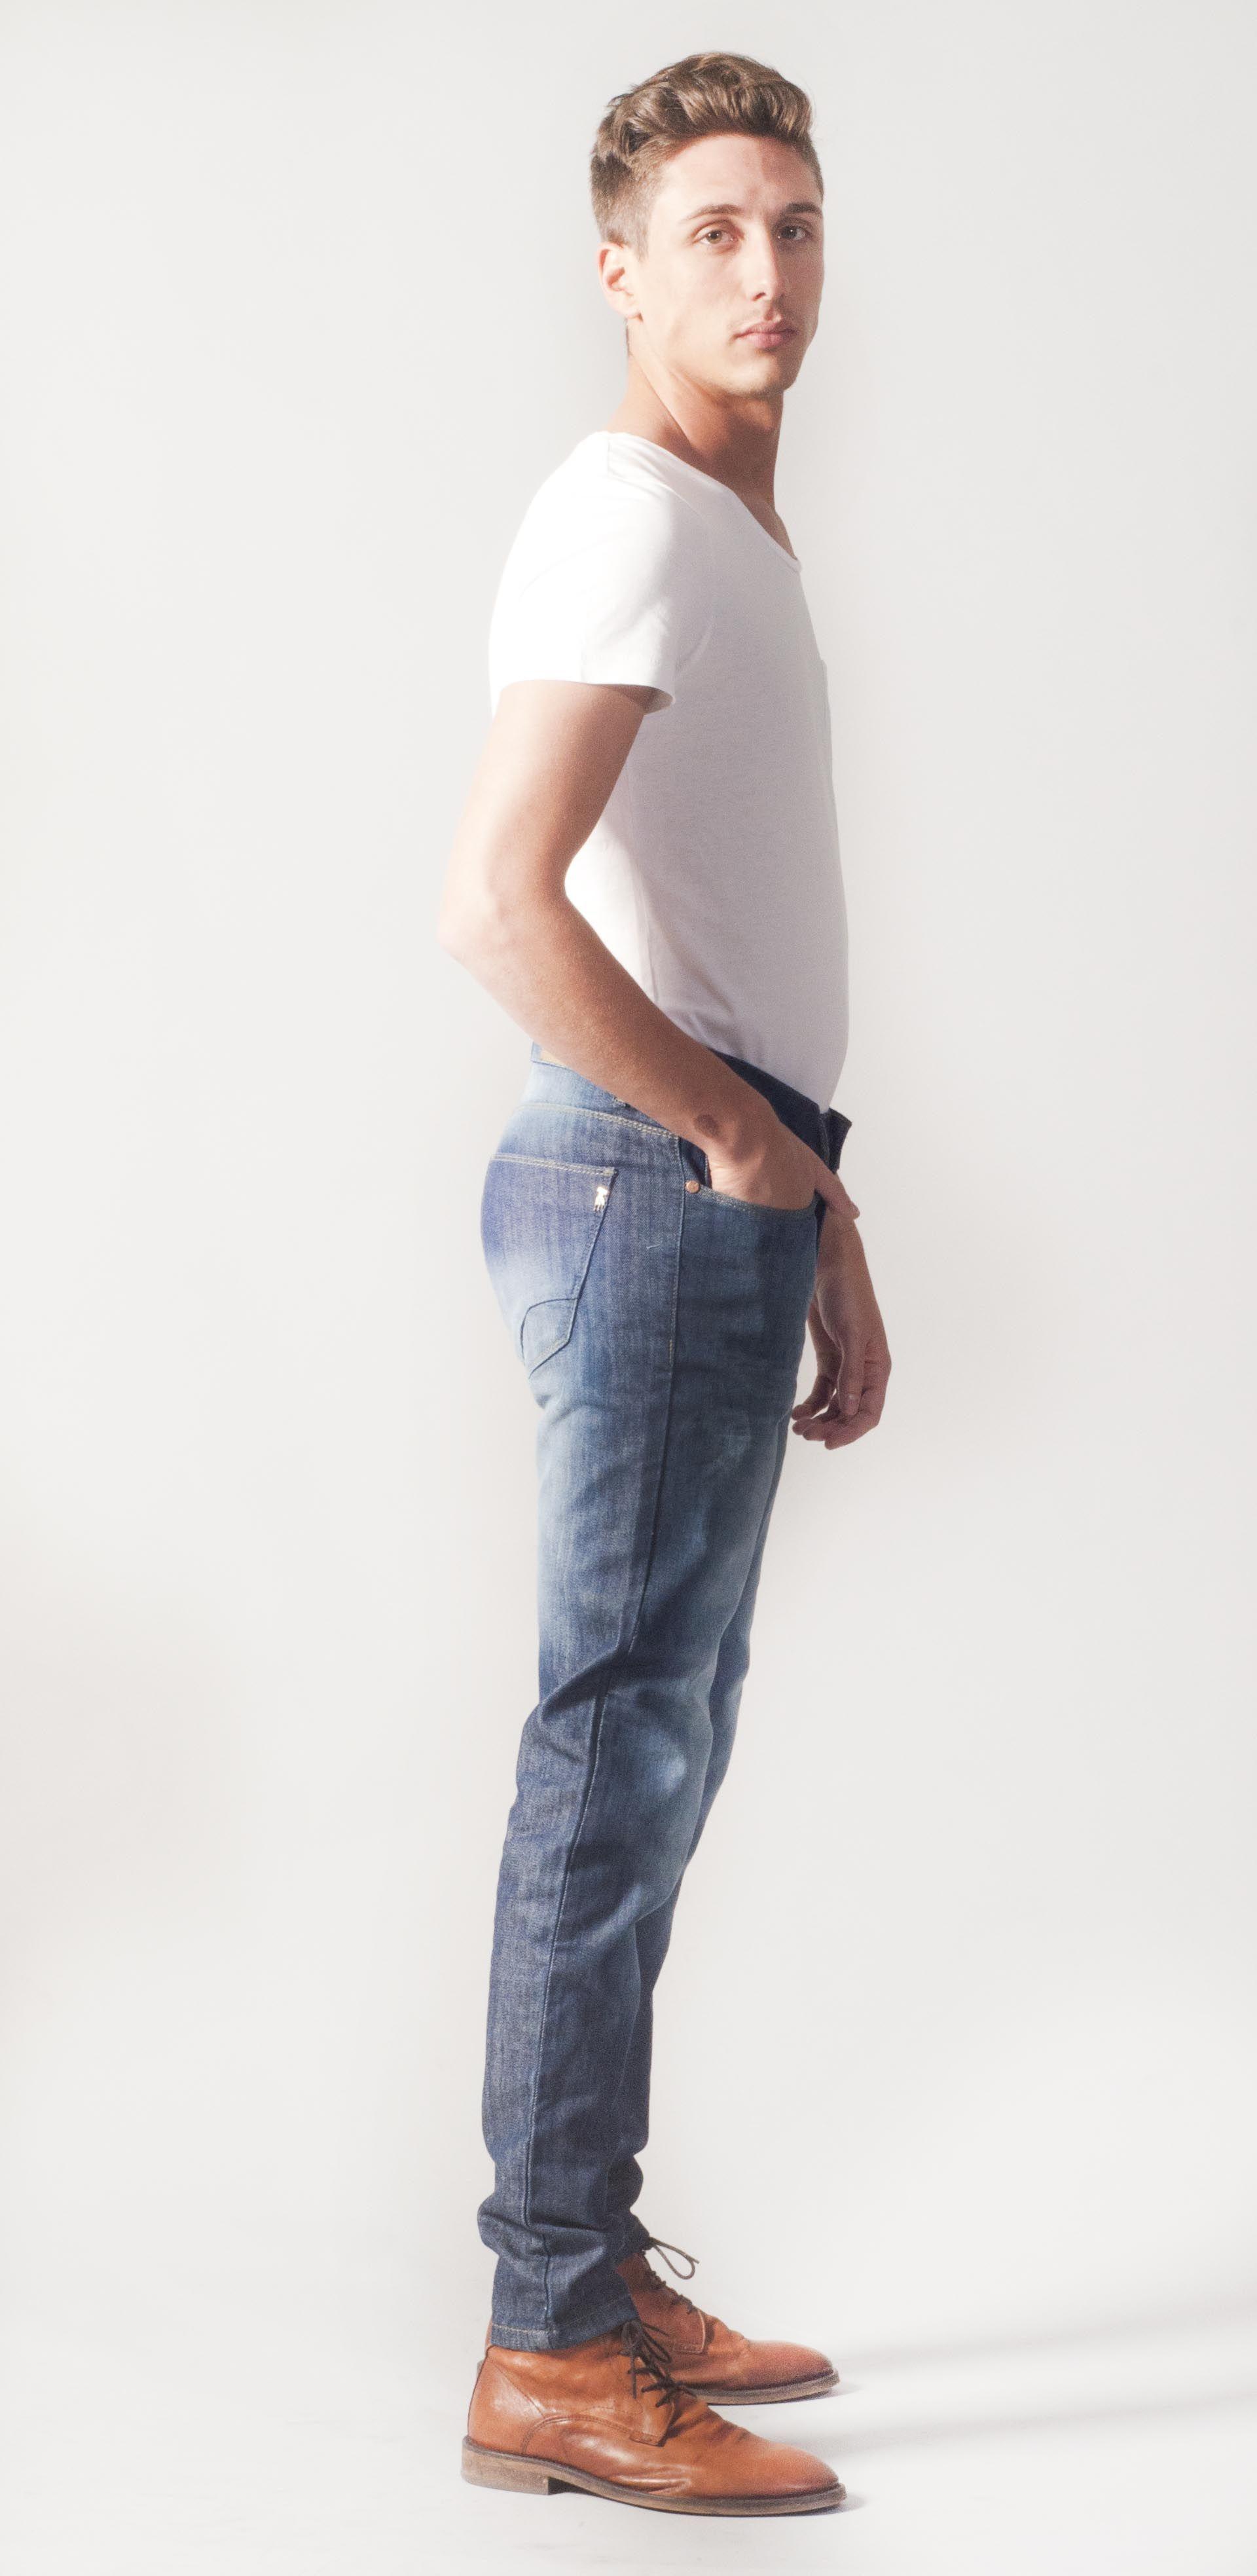 Skinny Jean Denim Straight Men Fashion Moda Menswear Garcon Garcia Shop Elegant Mocasines Chupin Hombre Jeans Hombre Hombres Jeans